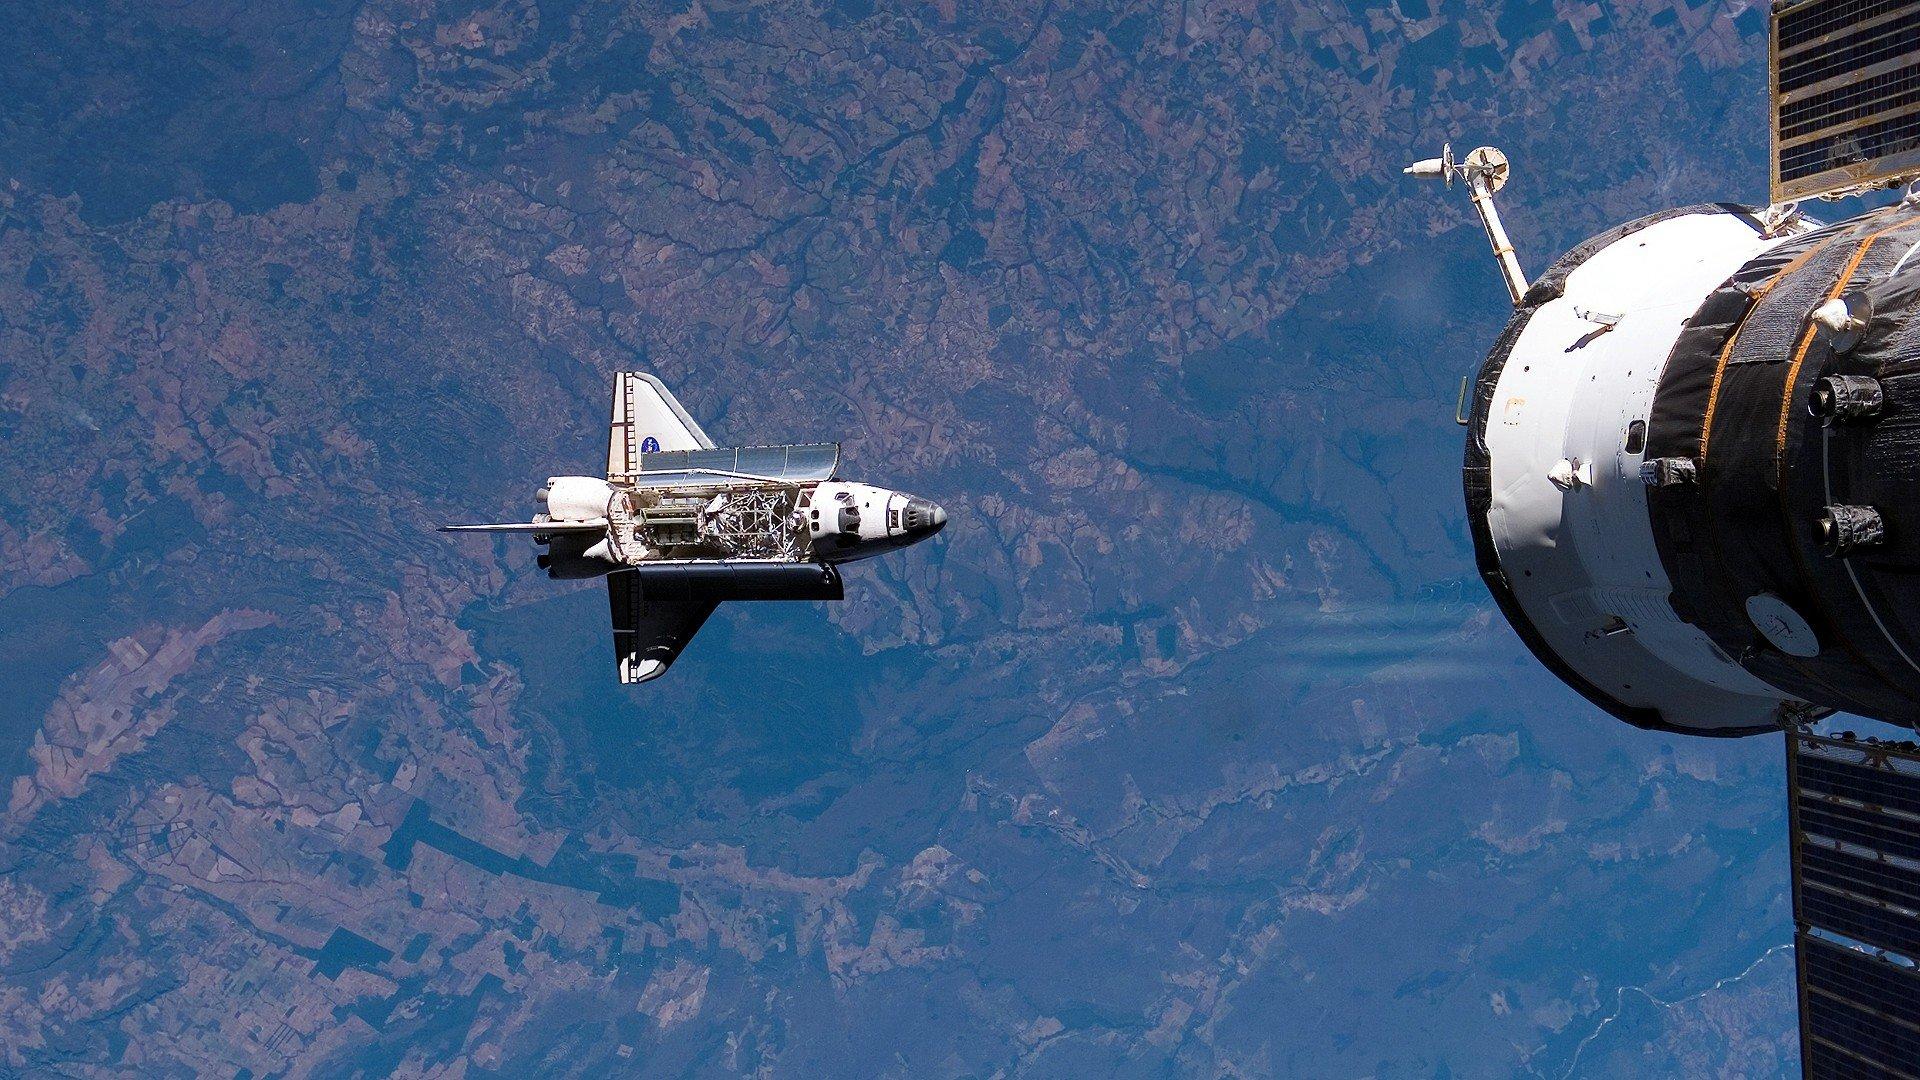 NASA, Space, Space Shuttle, Earth, Orbital Stations Wallpaper